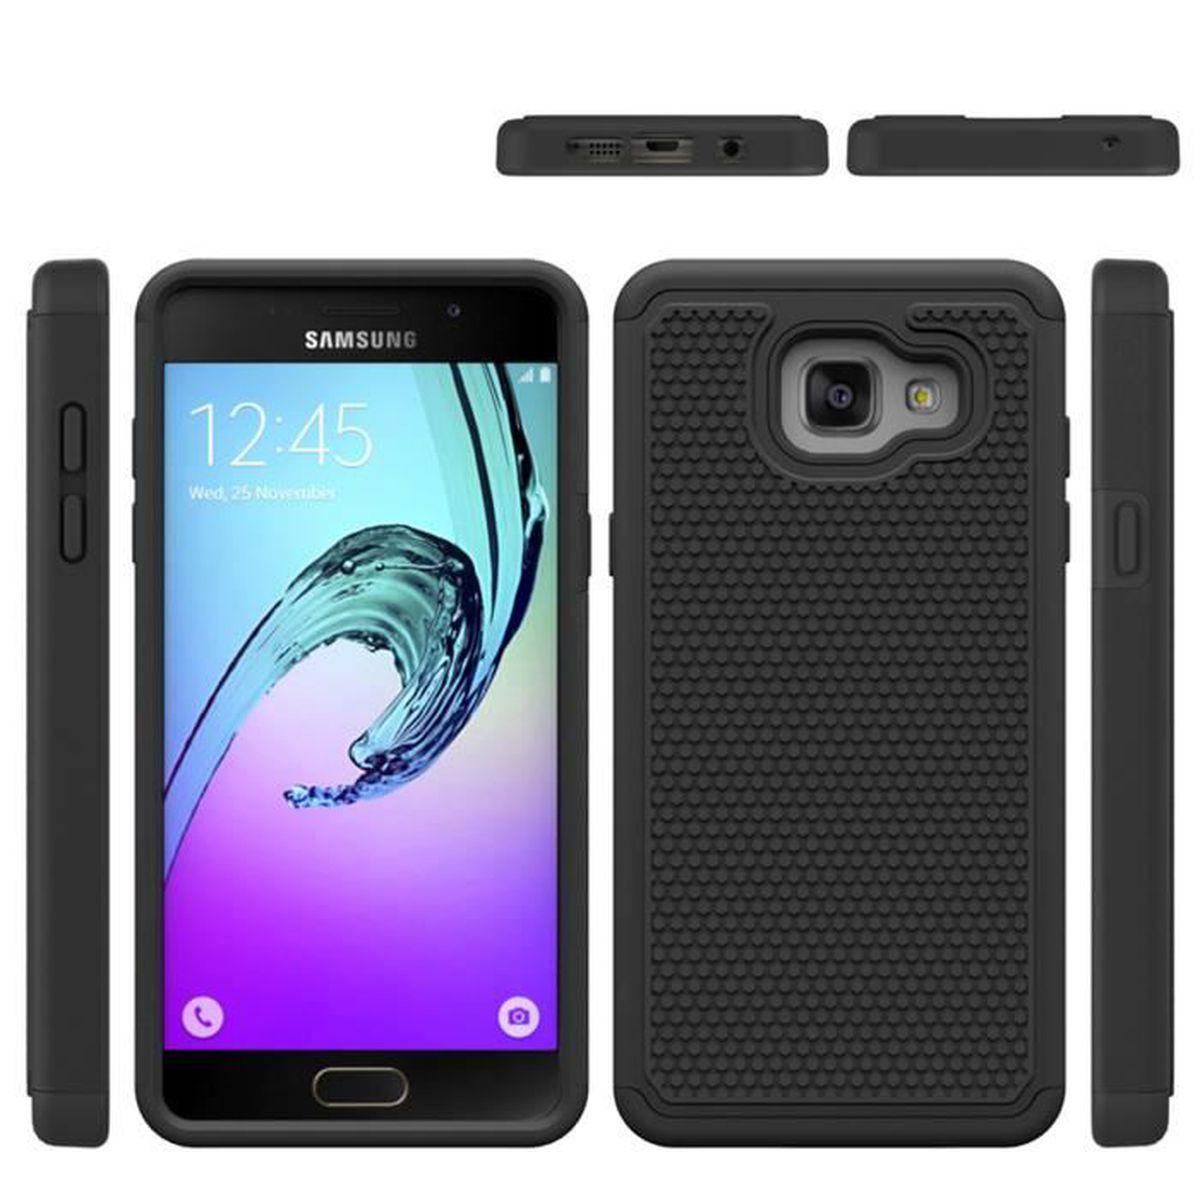 Coque samsung galaxy a5 2016 pas cher page 1 - Galaxy A5 2016 Coque Double Protection Antichoc